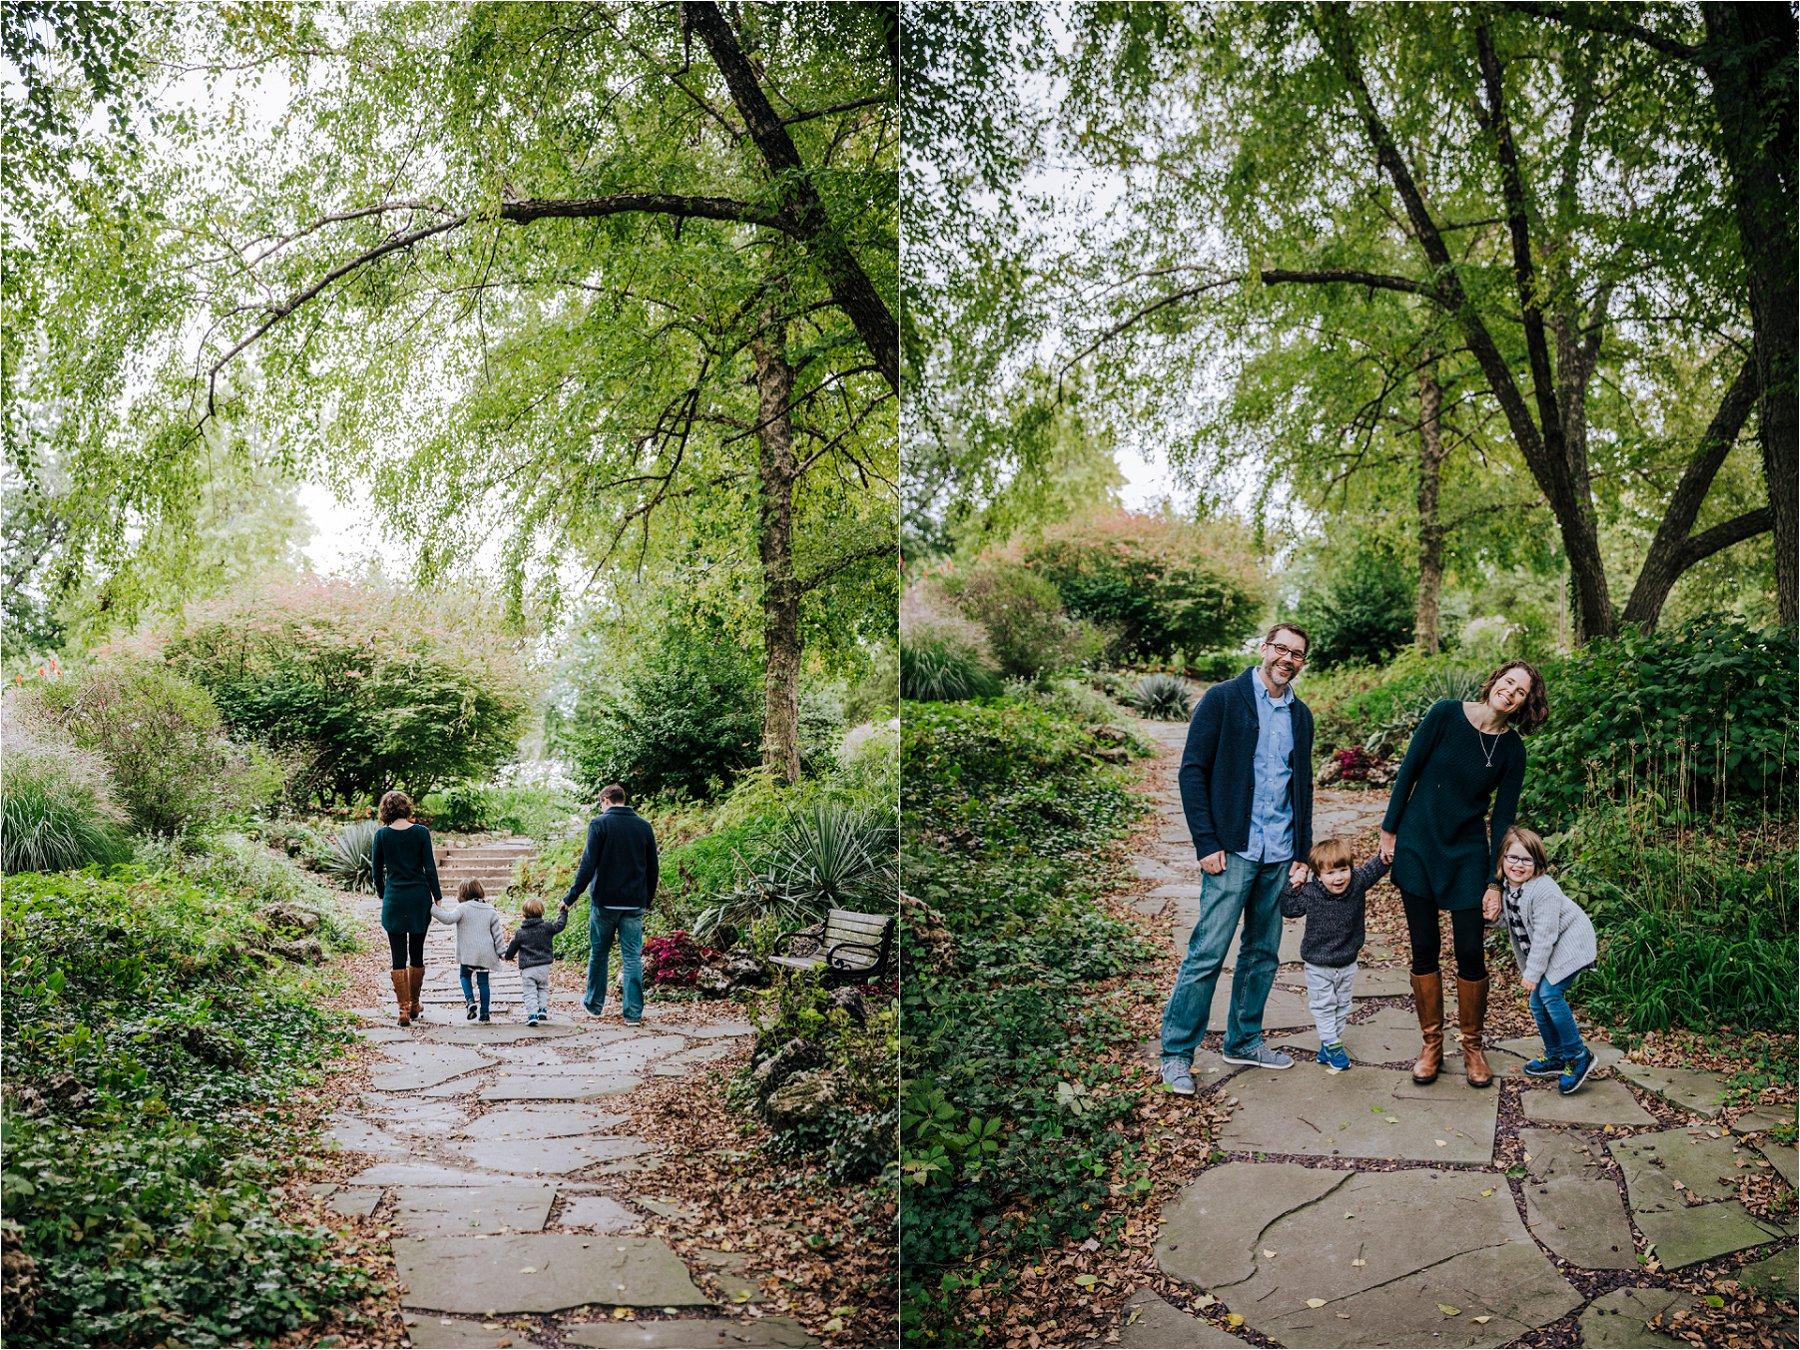 SHERRYLANEPHOTOGRAPHY_STLOUISFAMILYPHOTOGRAPHER_CAUL_2018_ (6).jpg